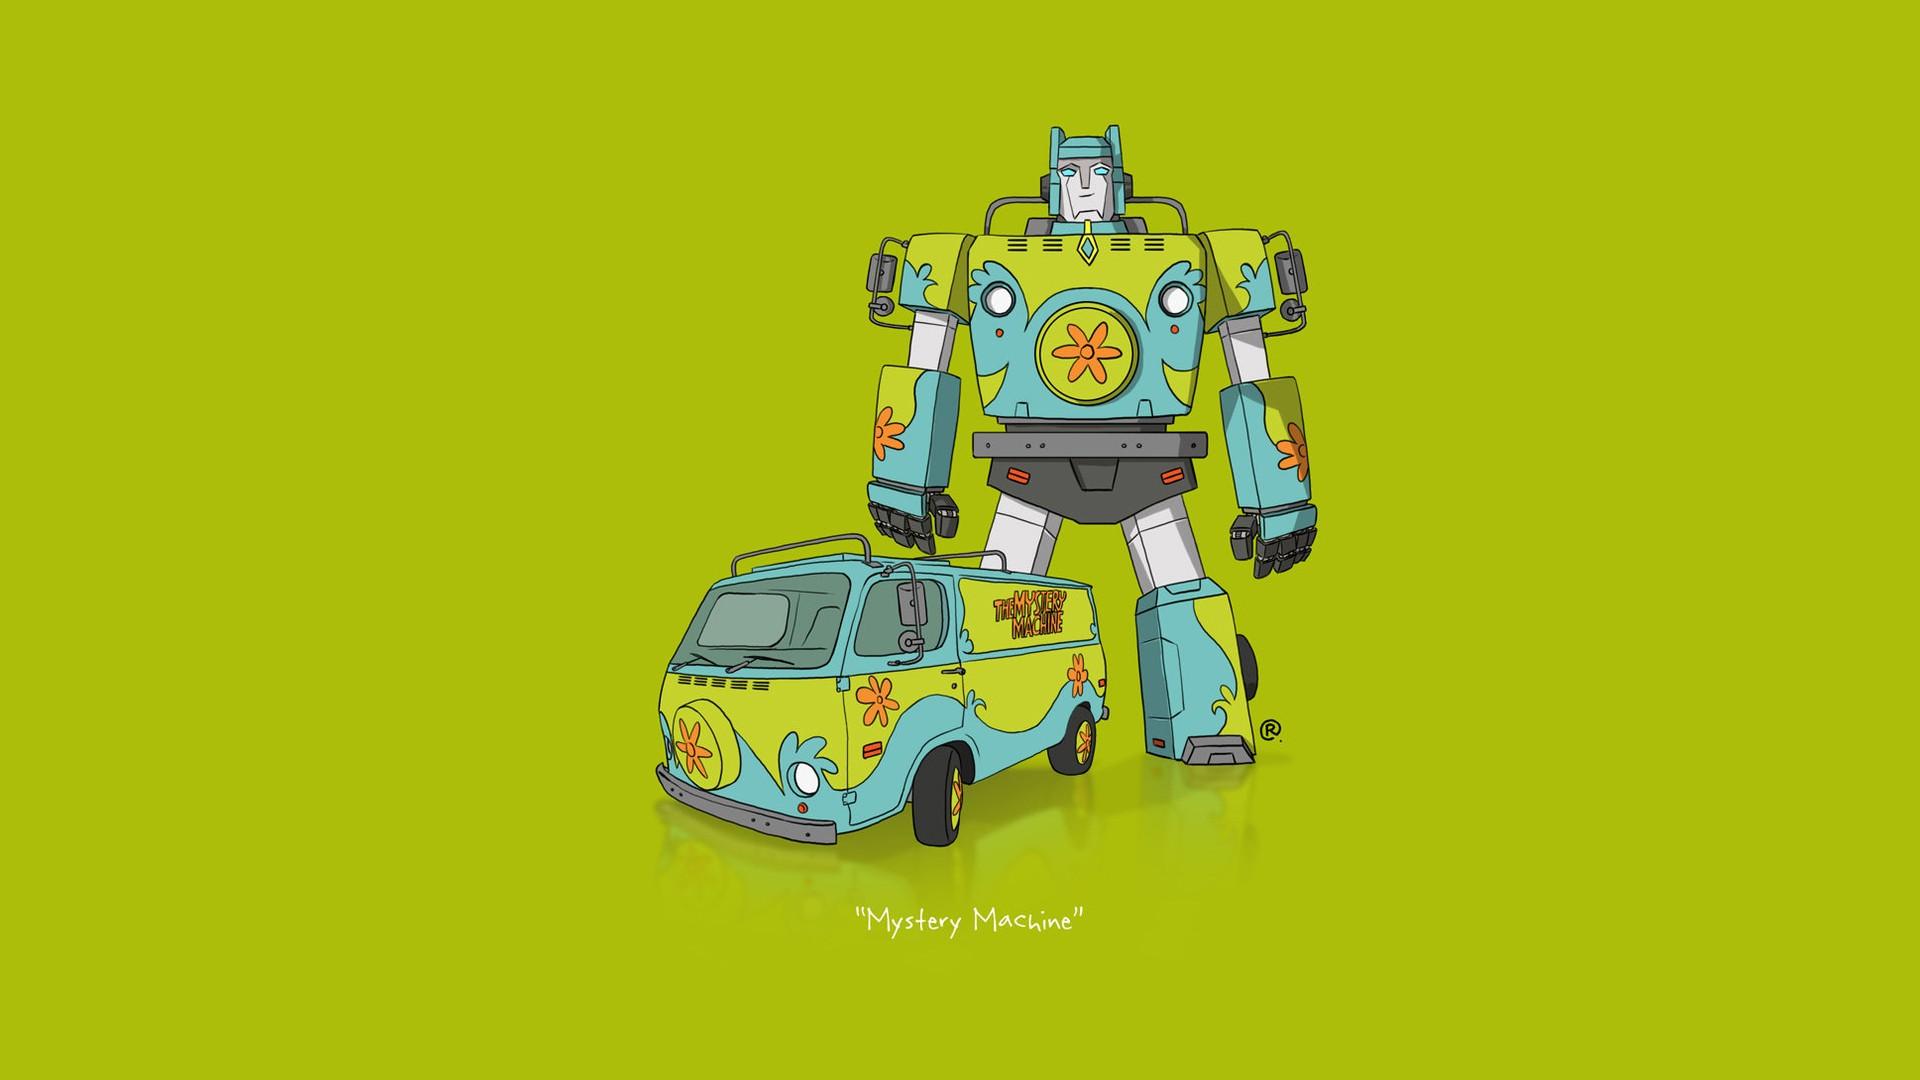 illustration voiture minimalisme vhicule transformers dessin anim scooby doo jouet machine 1920x1080 px produit - Dessin Anim Scooby Doo